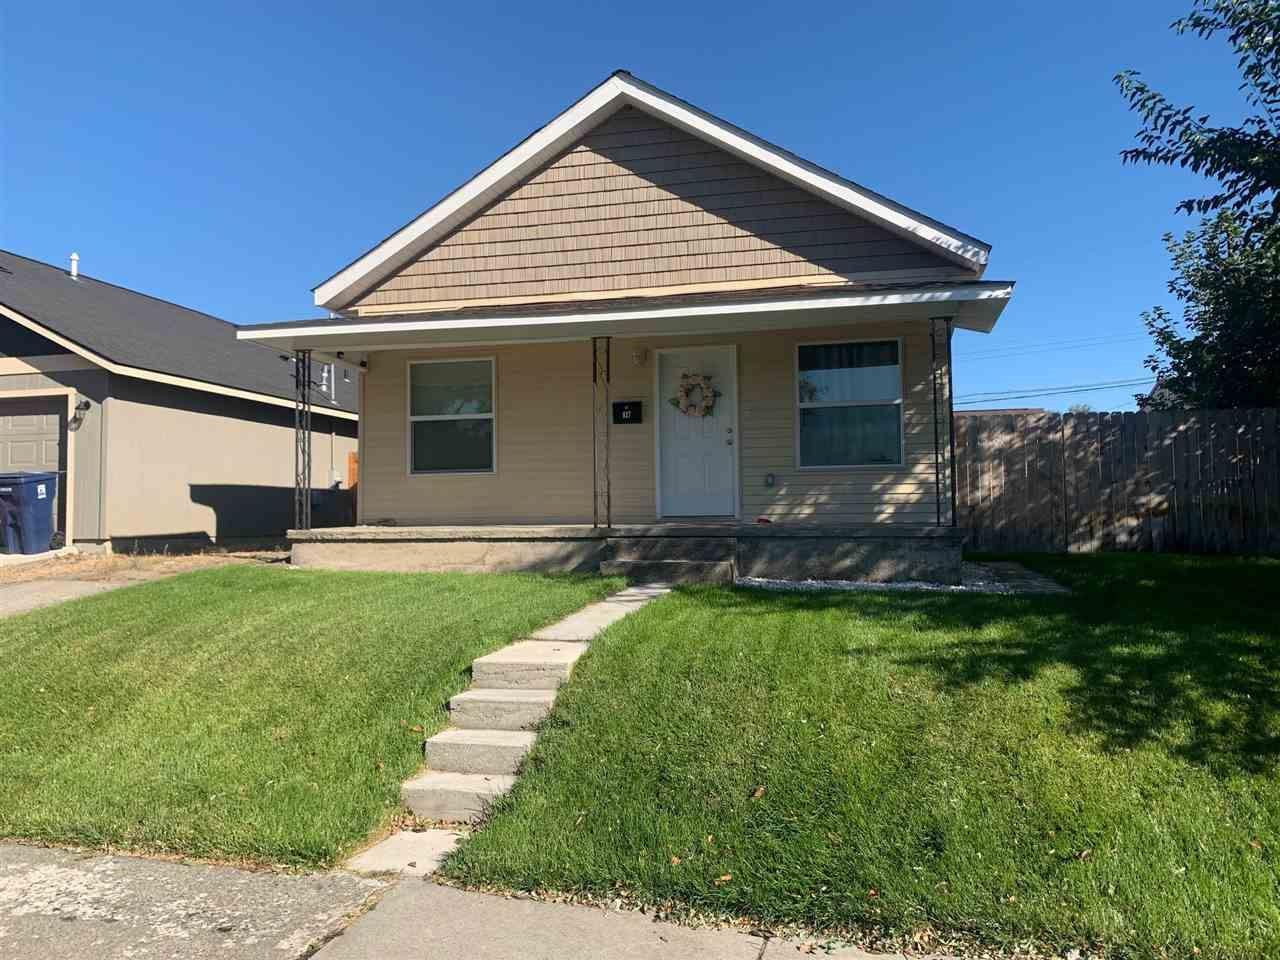 827 E Rockwell Ave, Spokane, WA 99207 - #: 202021853